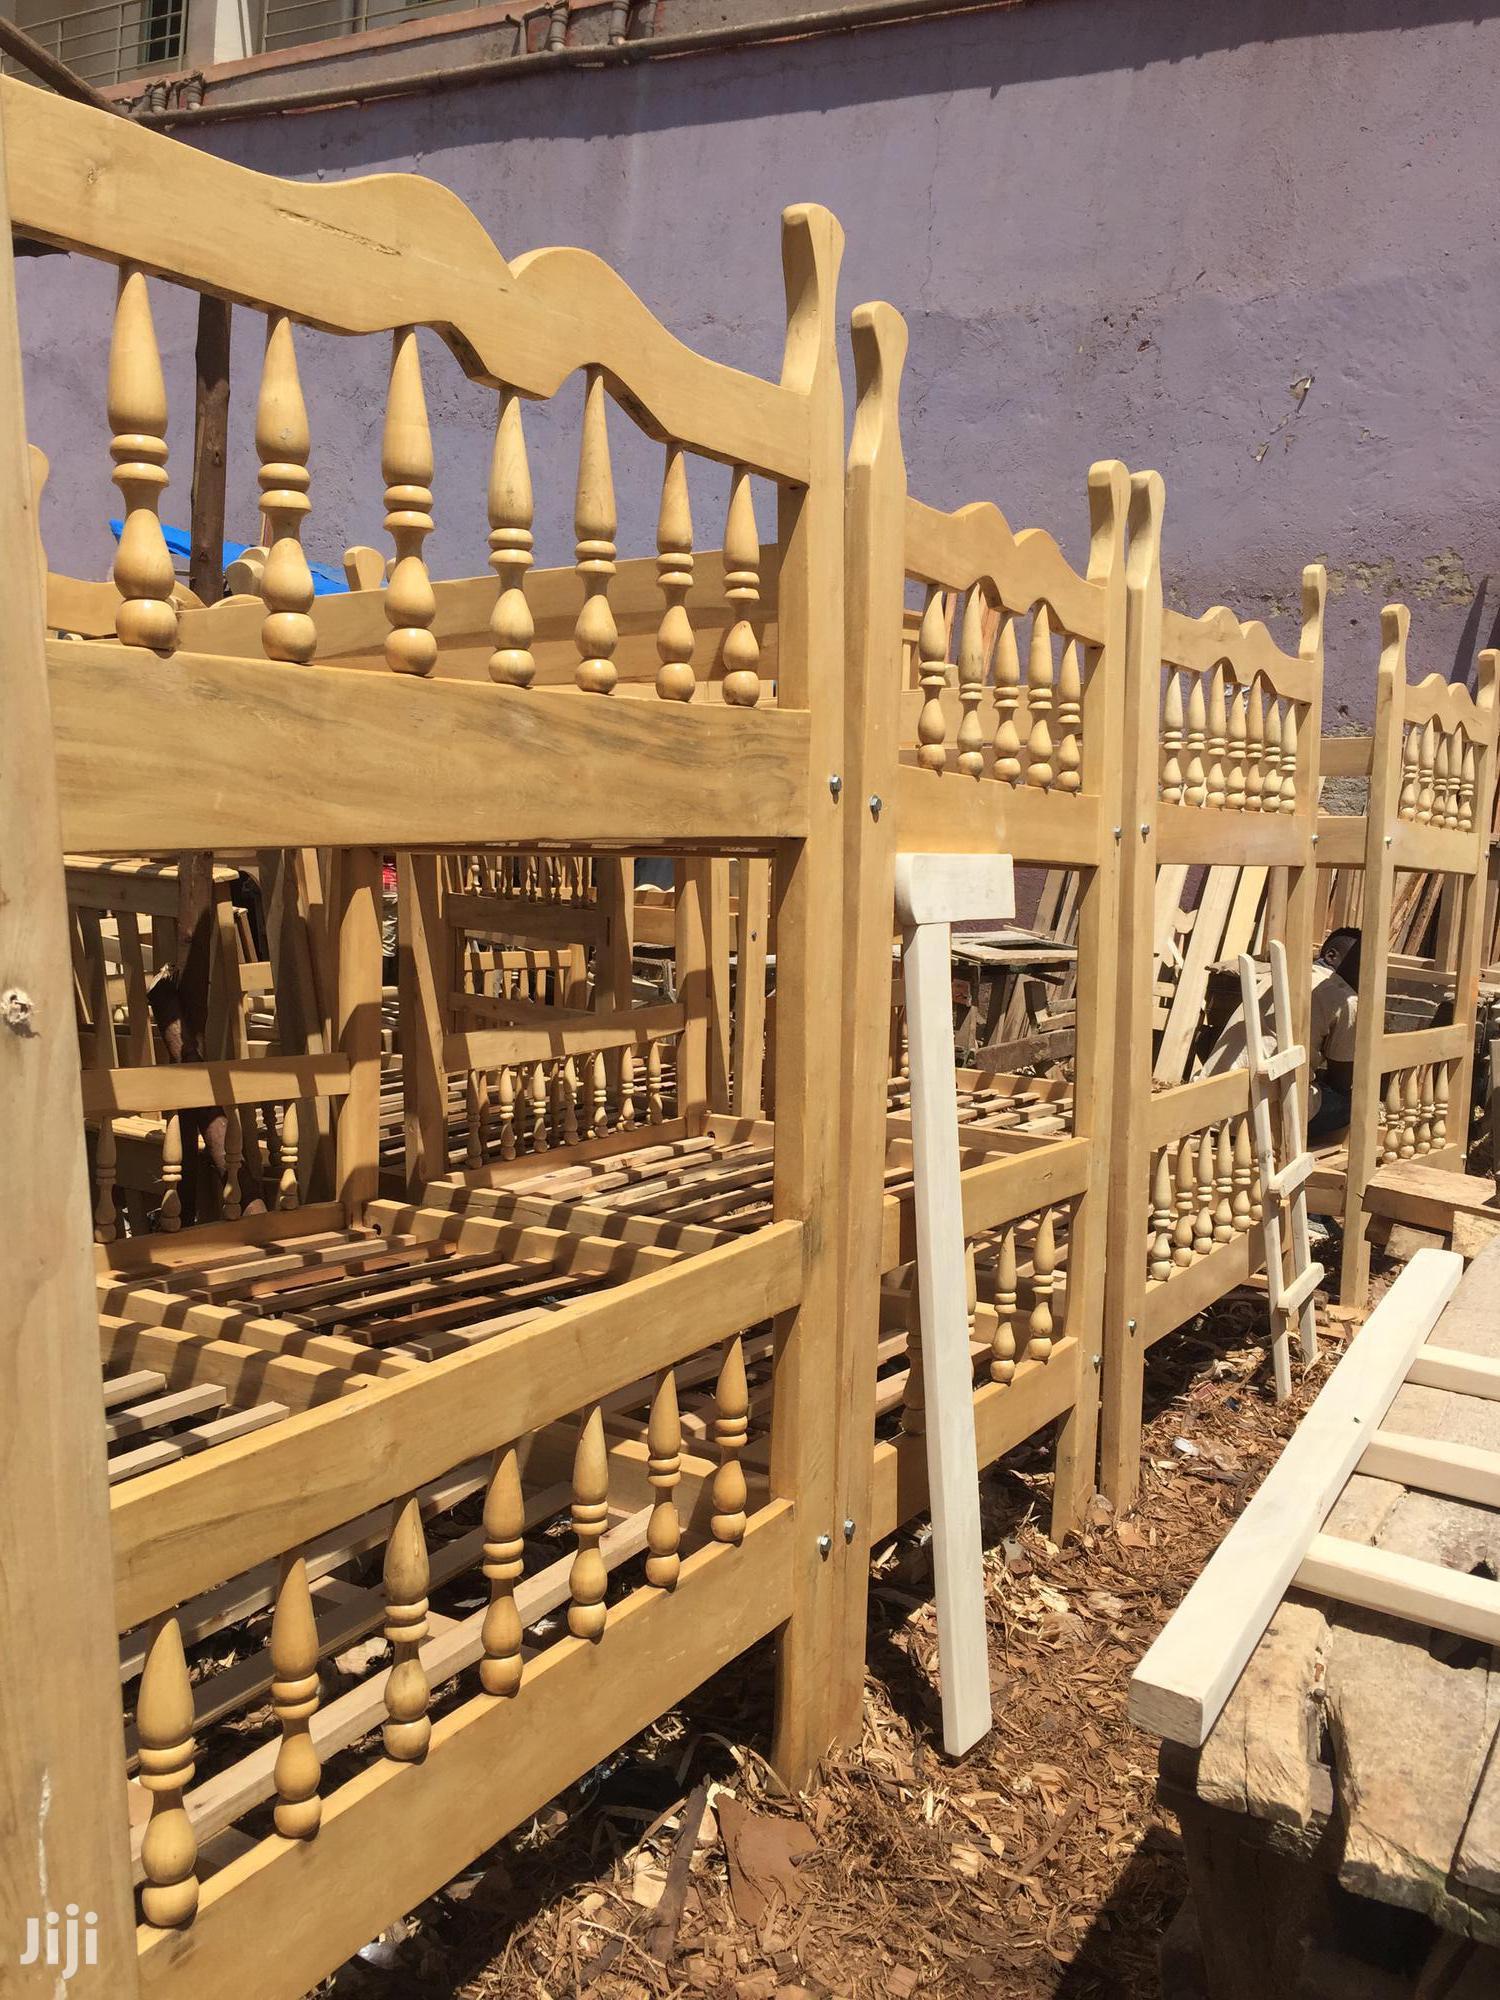 Kids Bunk Bed Medium Size | Children's Furniture for sale in Kampala, Central Region, Uganda